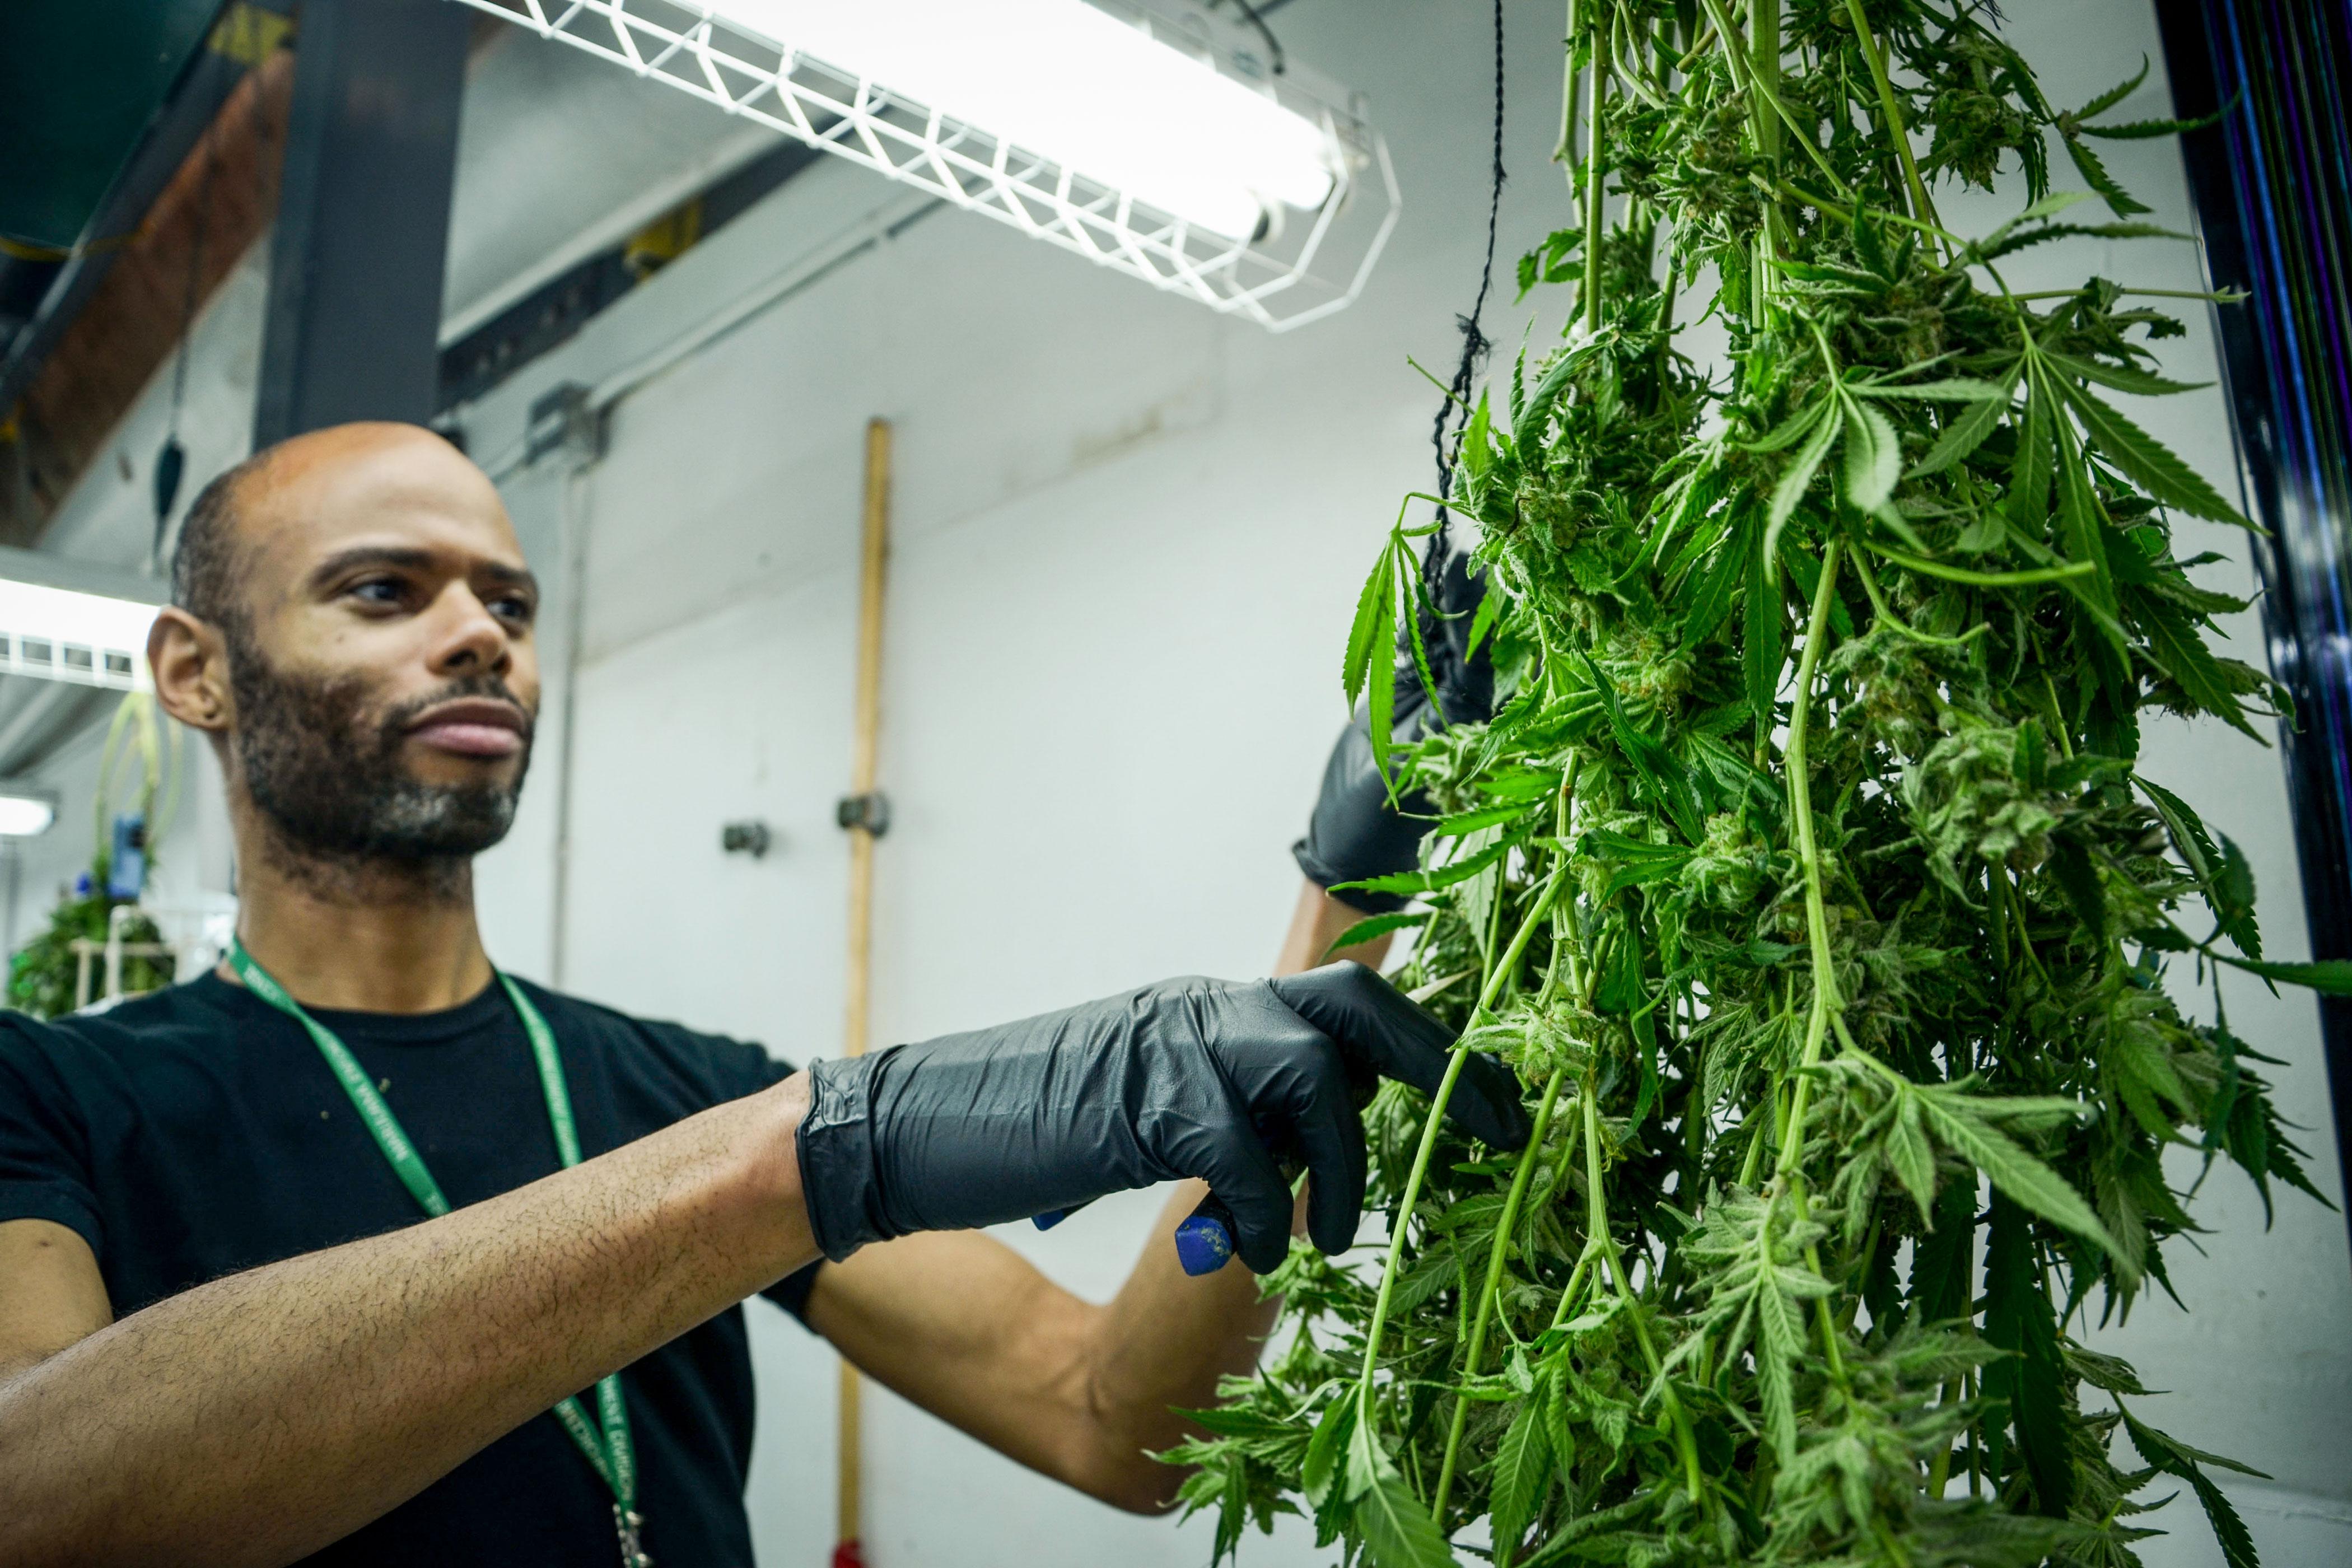 Unless You're A Citizen, Legal Marijuana Isn't For You